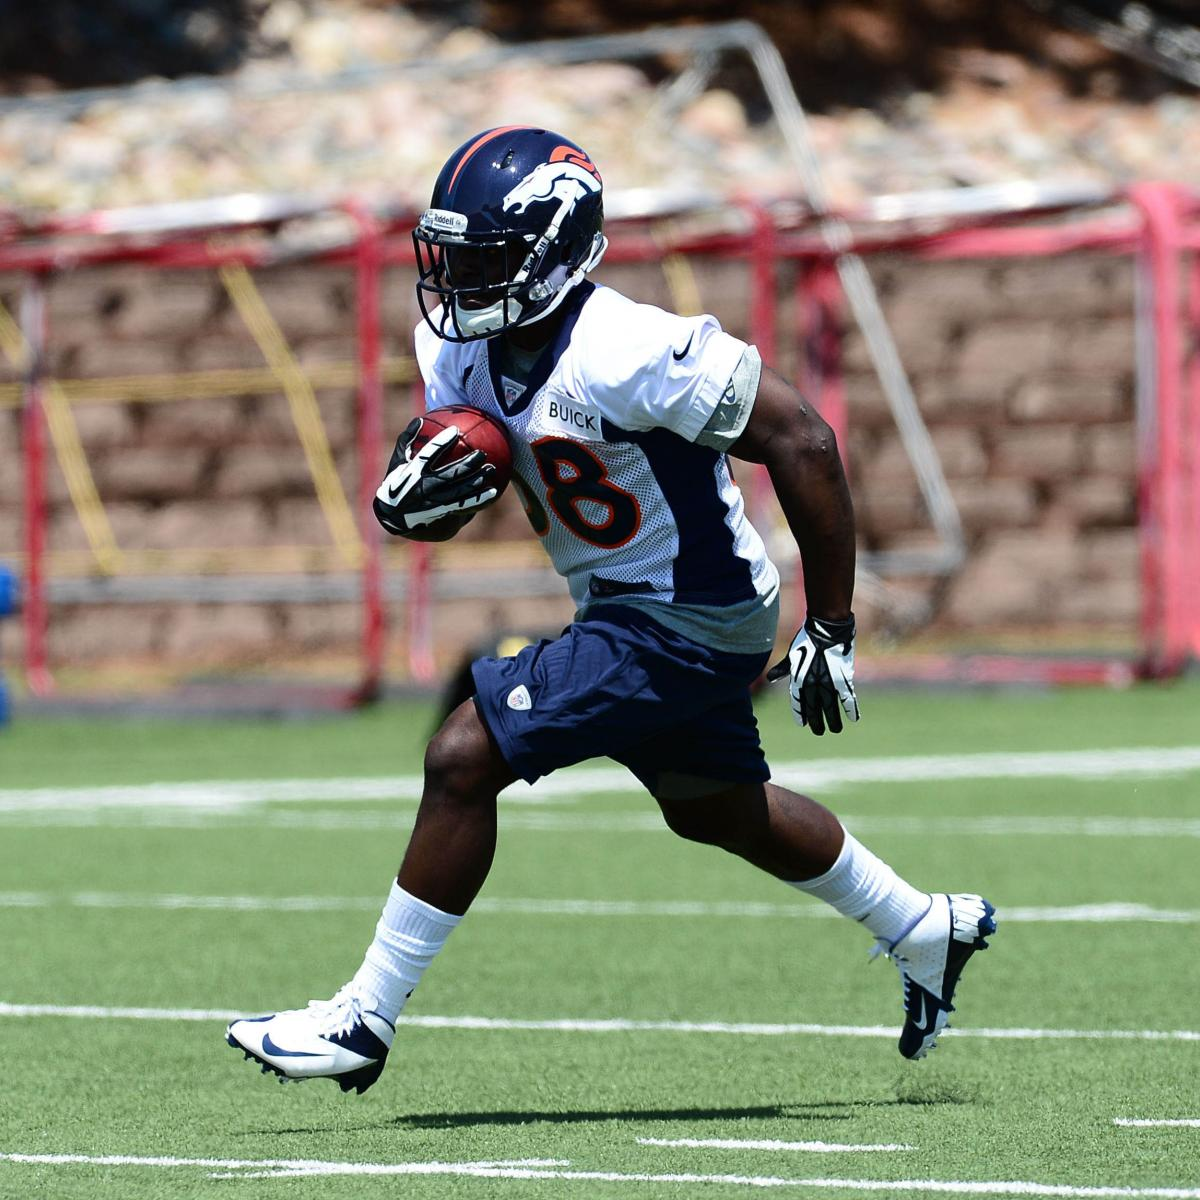 Denver Broncos Re Grading Their Key 2013 Offseason: Denver Broncos: Most Underrated And Overrated Offseason